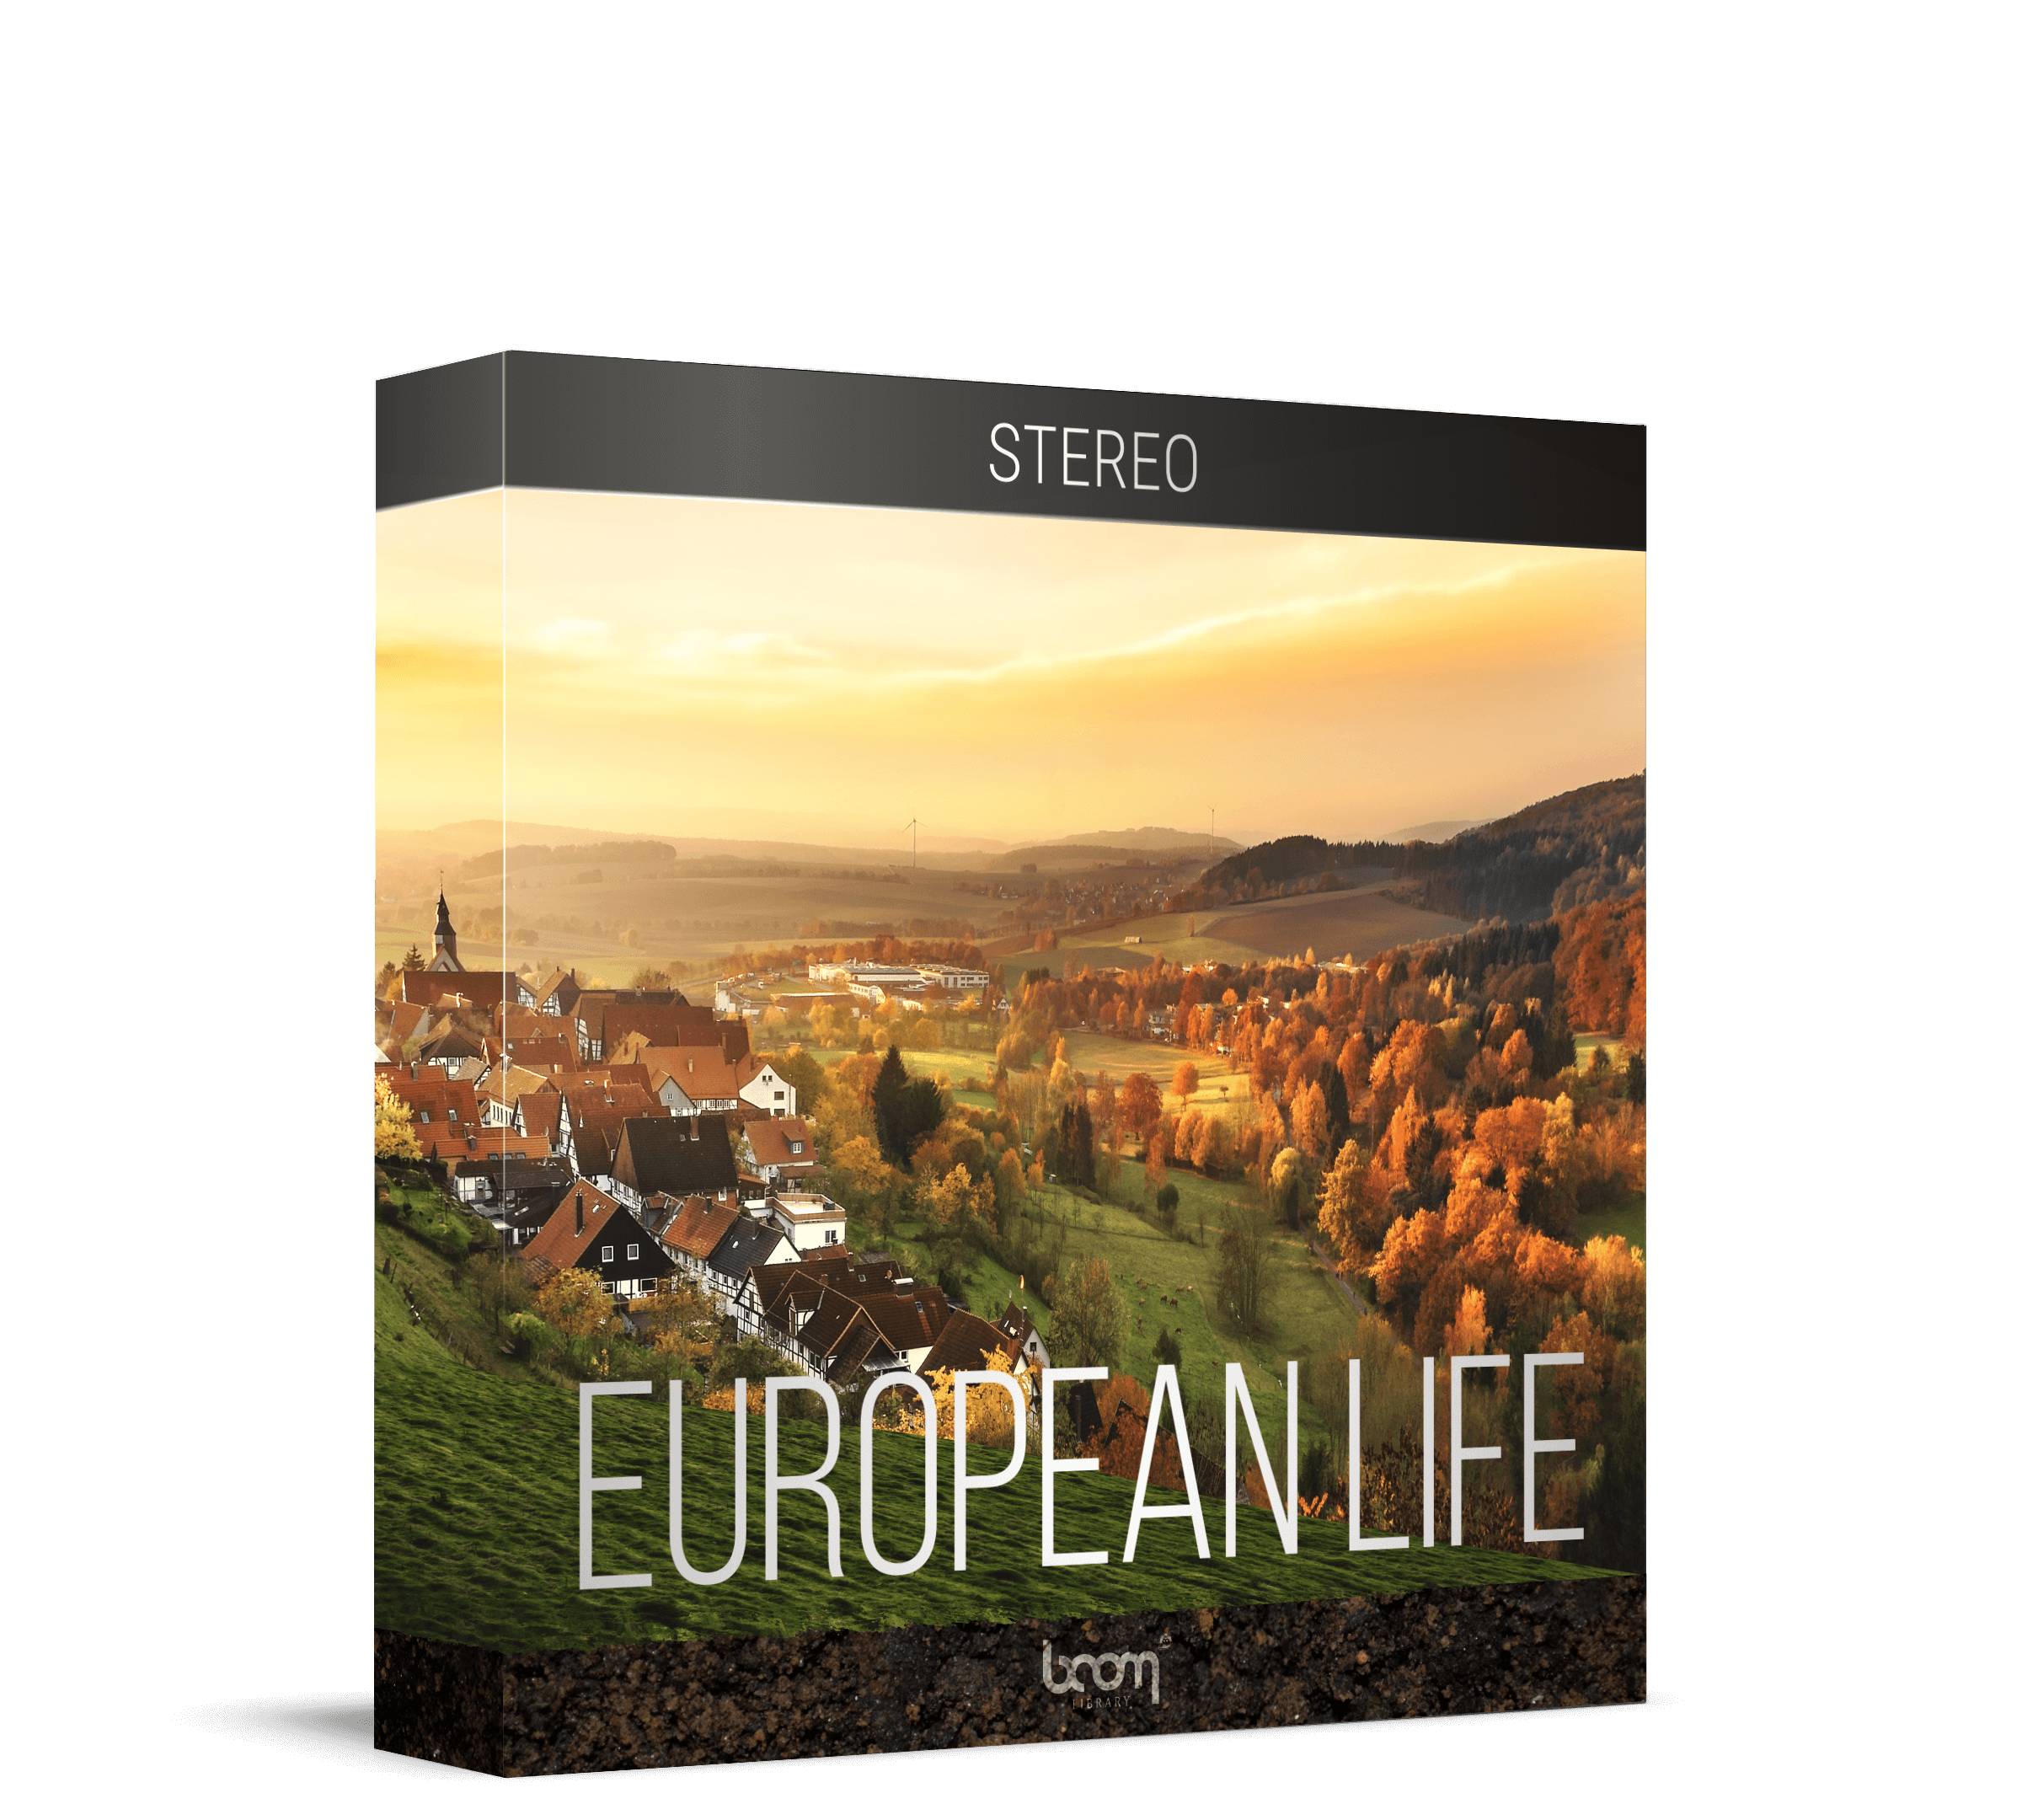 European Life Artwork